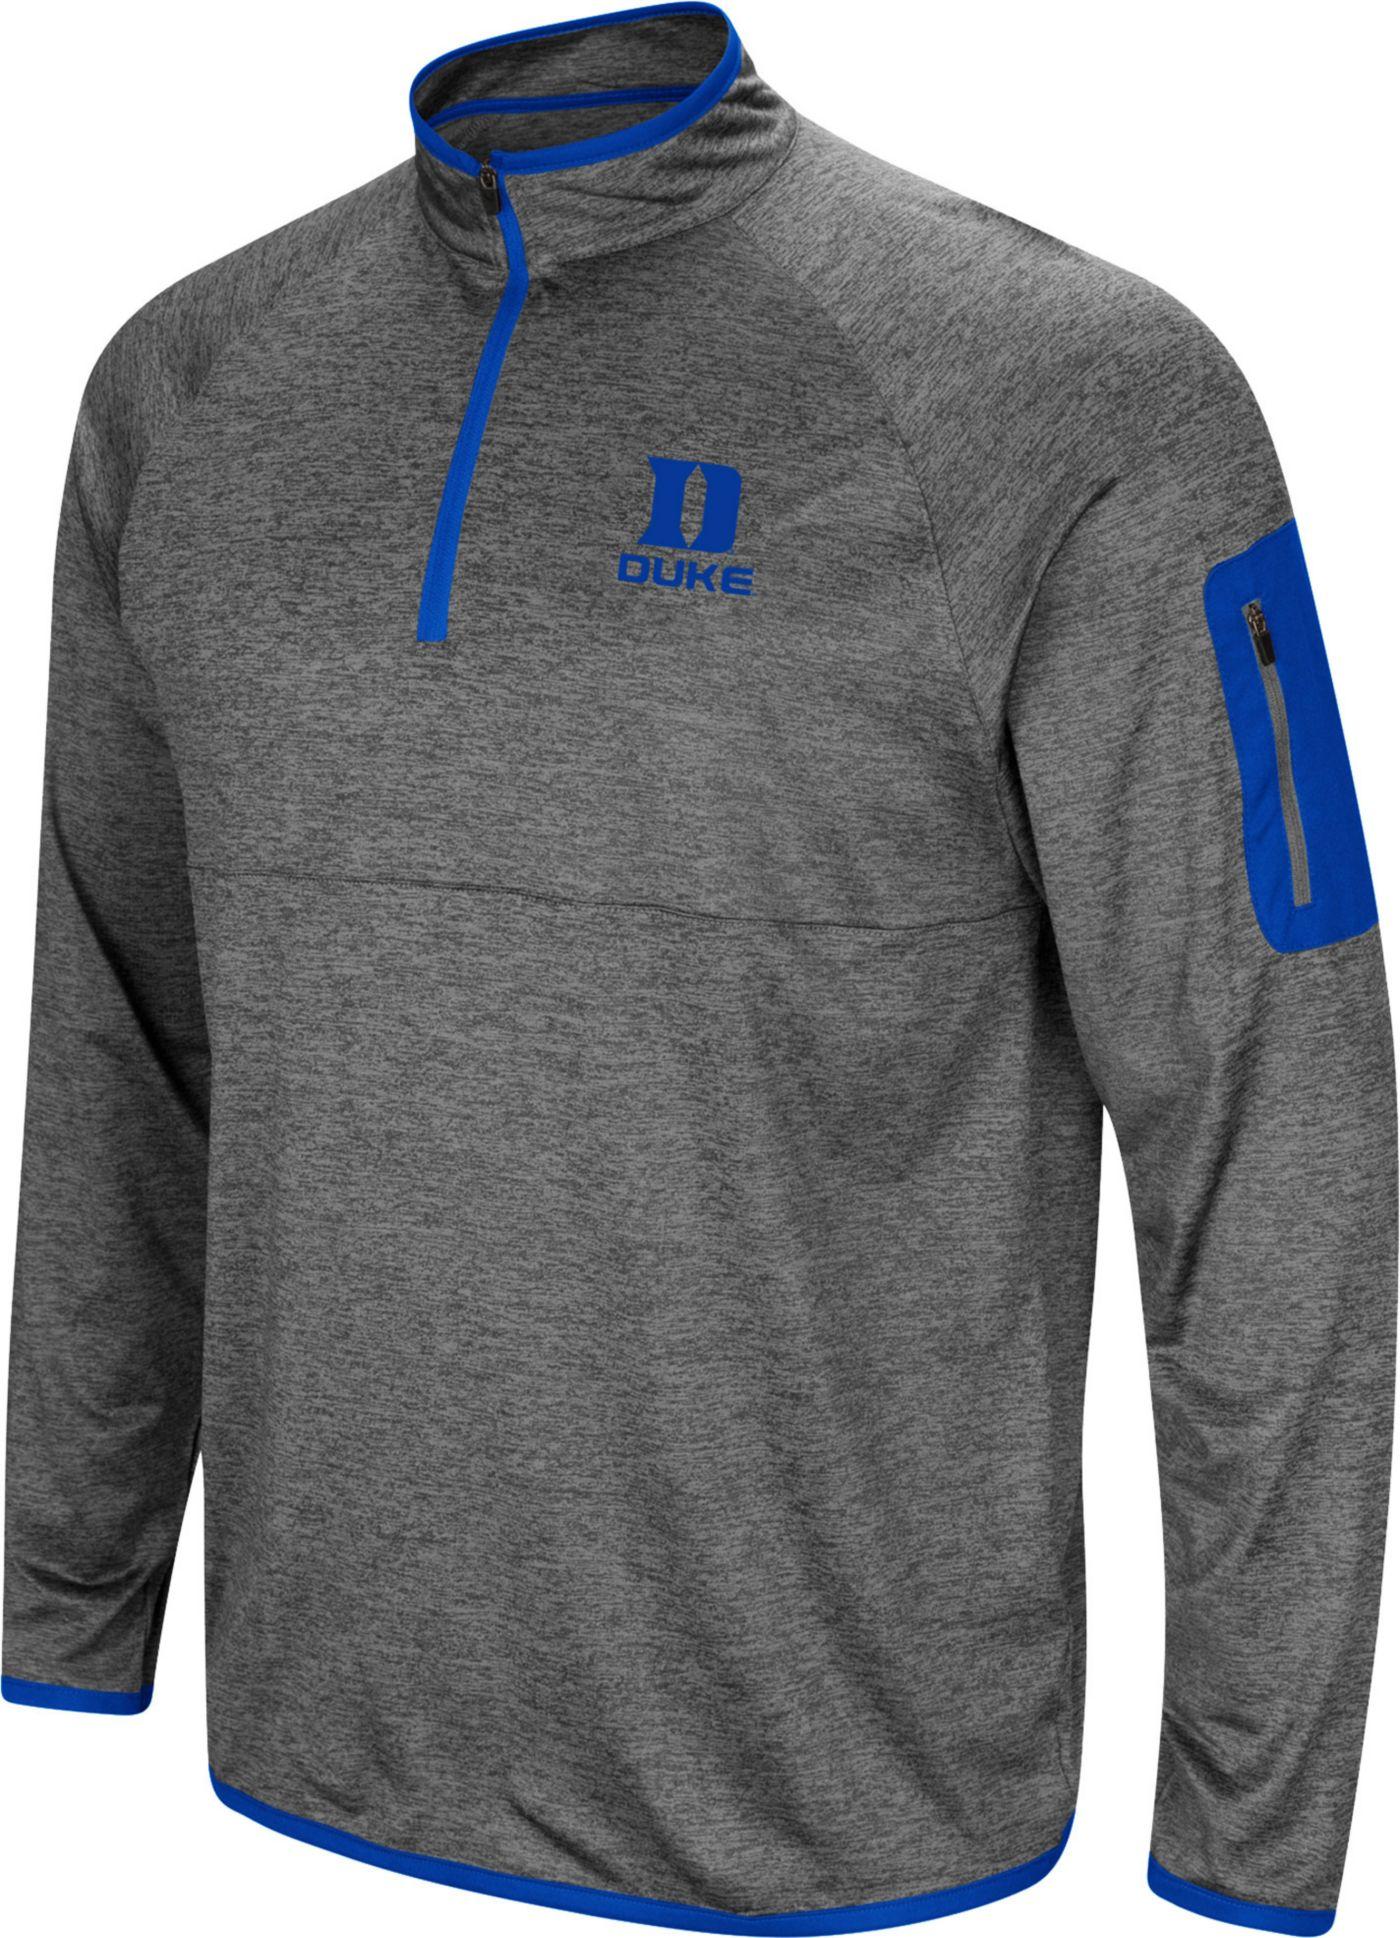 Colosseum Men's Duke Blue Devils Grey Indus River Quarter-Zip Shirt